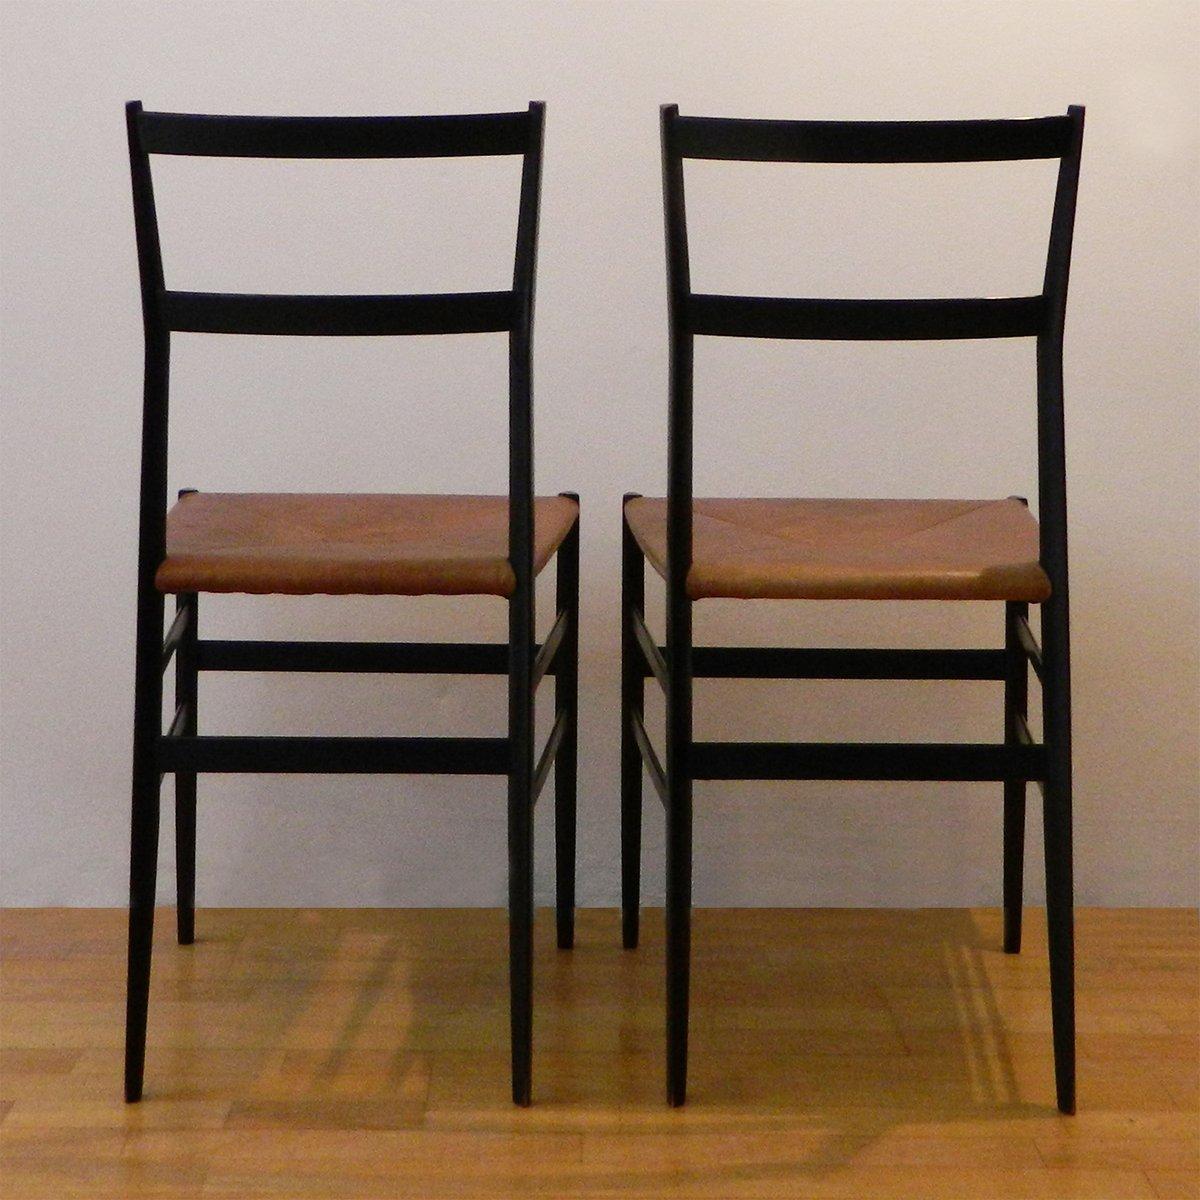 Chiavari Chairs Weight Limit By Superleggera Leather Gio Ponti For Cassina Set